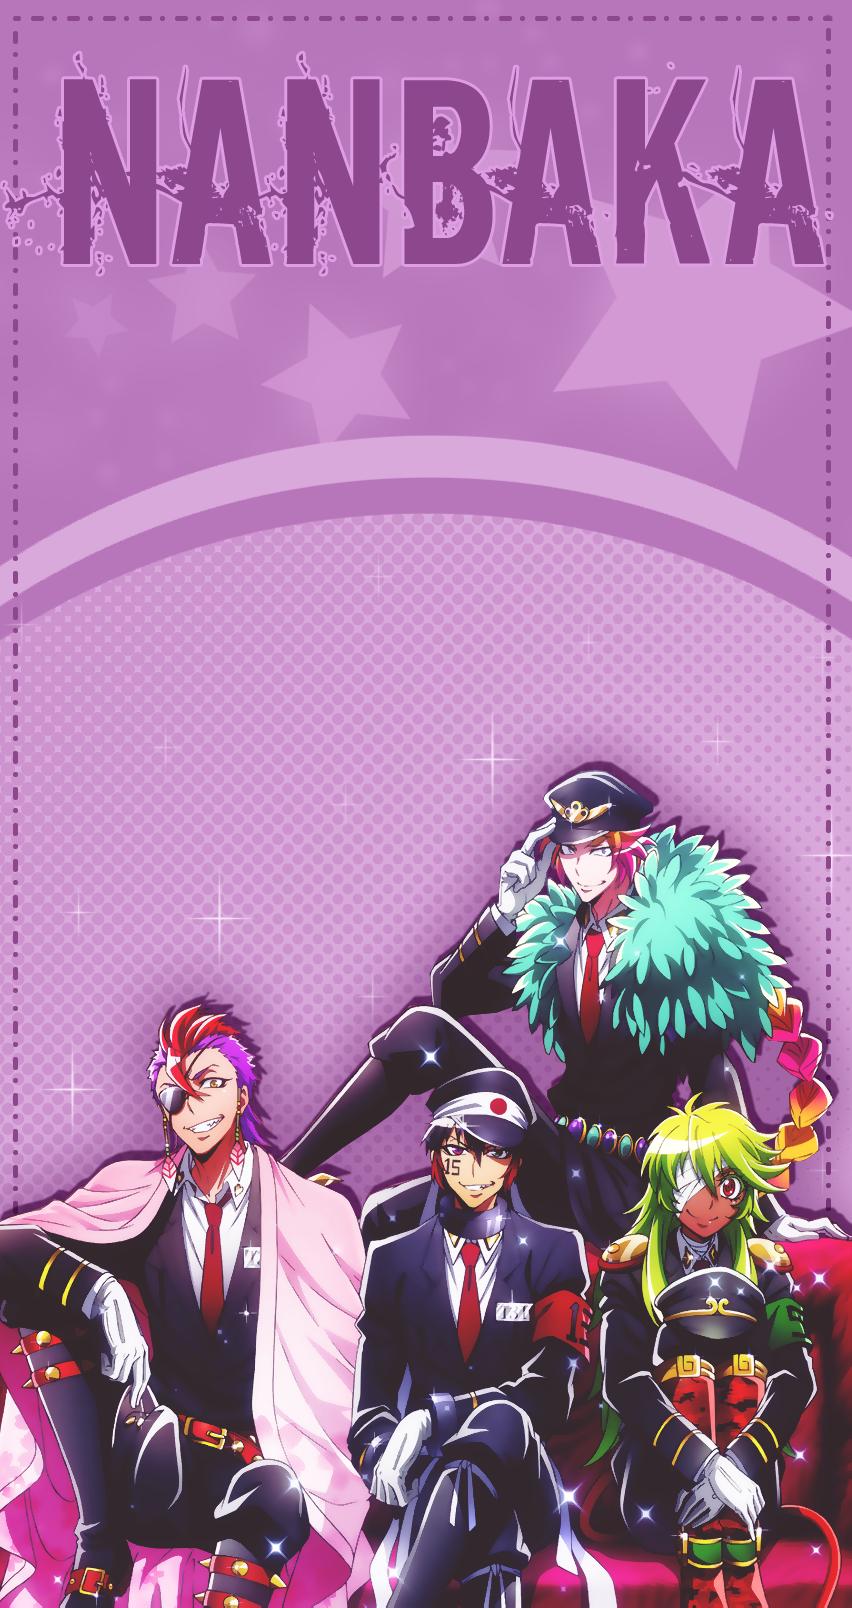 Nanbaka Anime Anime Wallpaper Otaku Anime